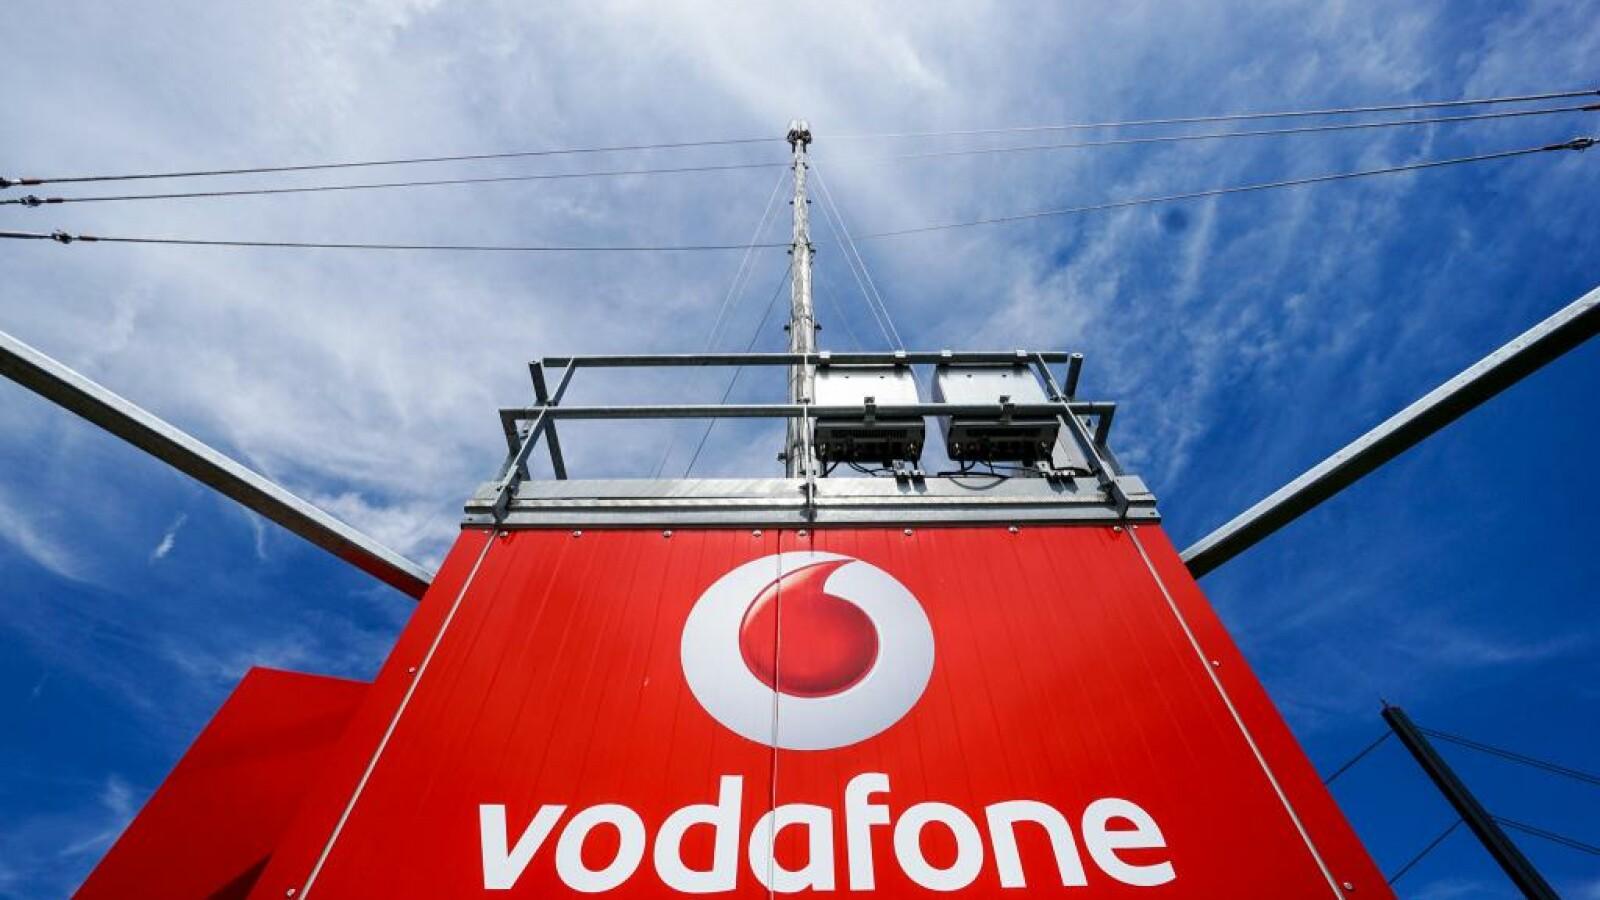 Vodafone reagiert auf Corona: Kunden erhalten Social Pass, Office 365 und Pay-TV gratis